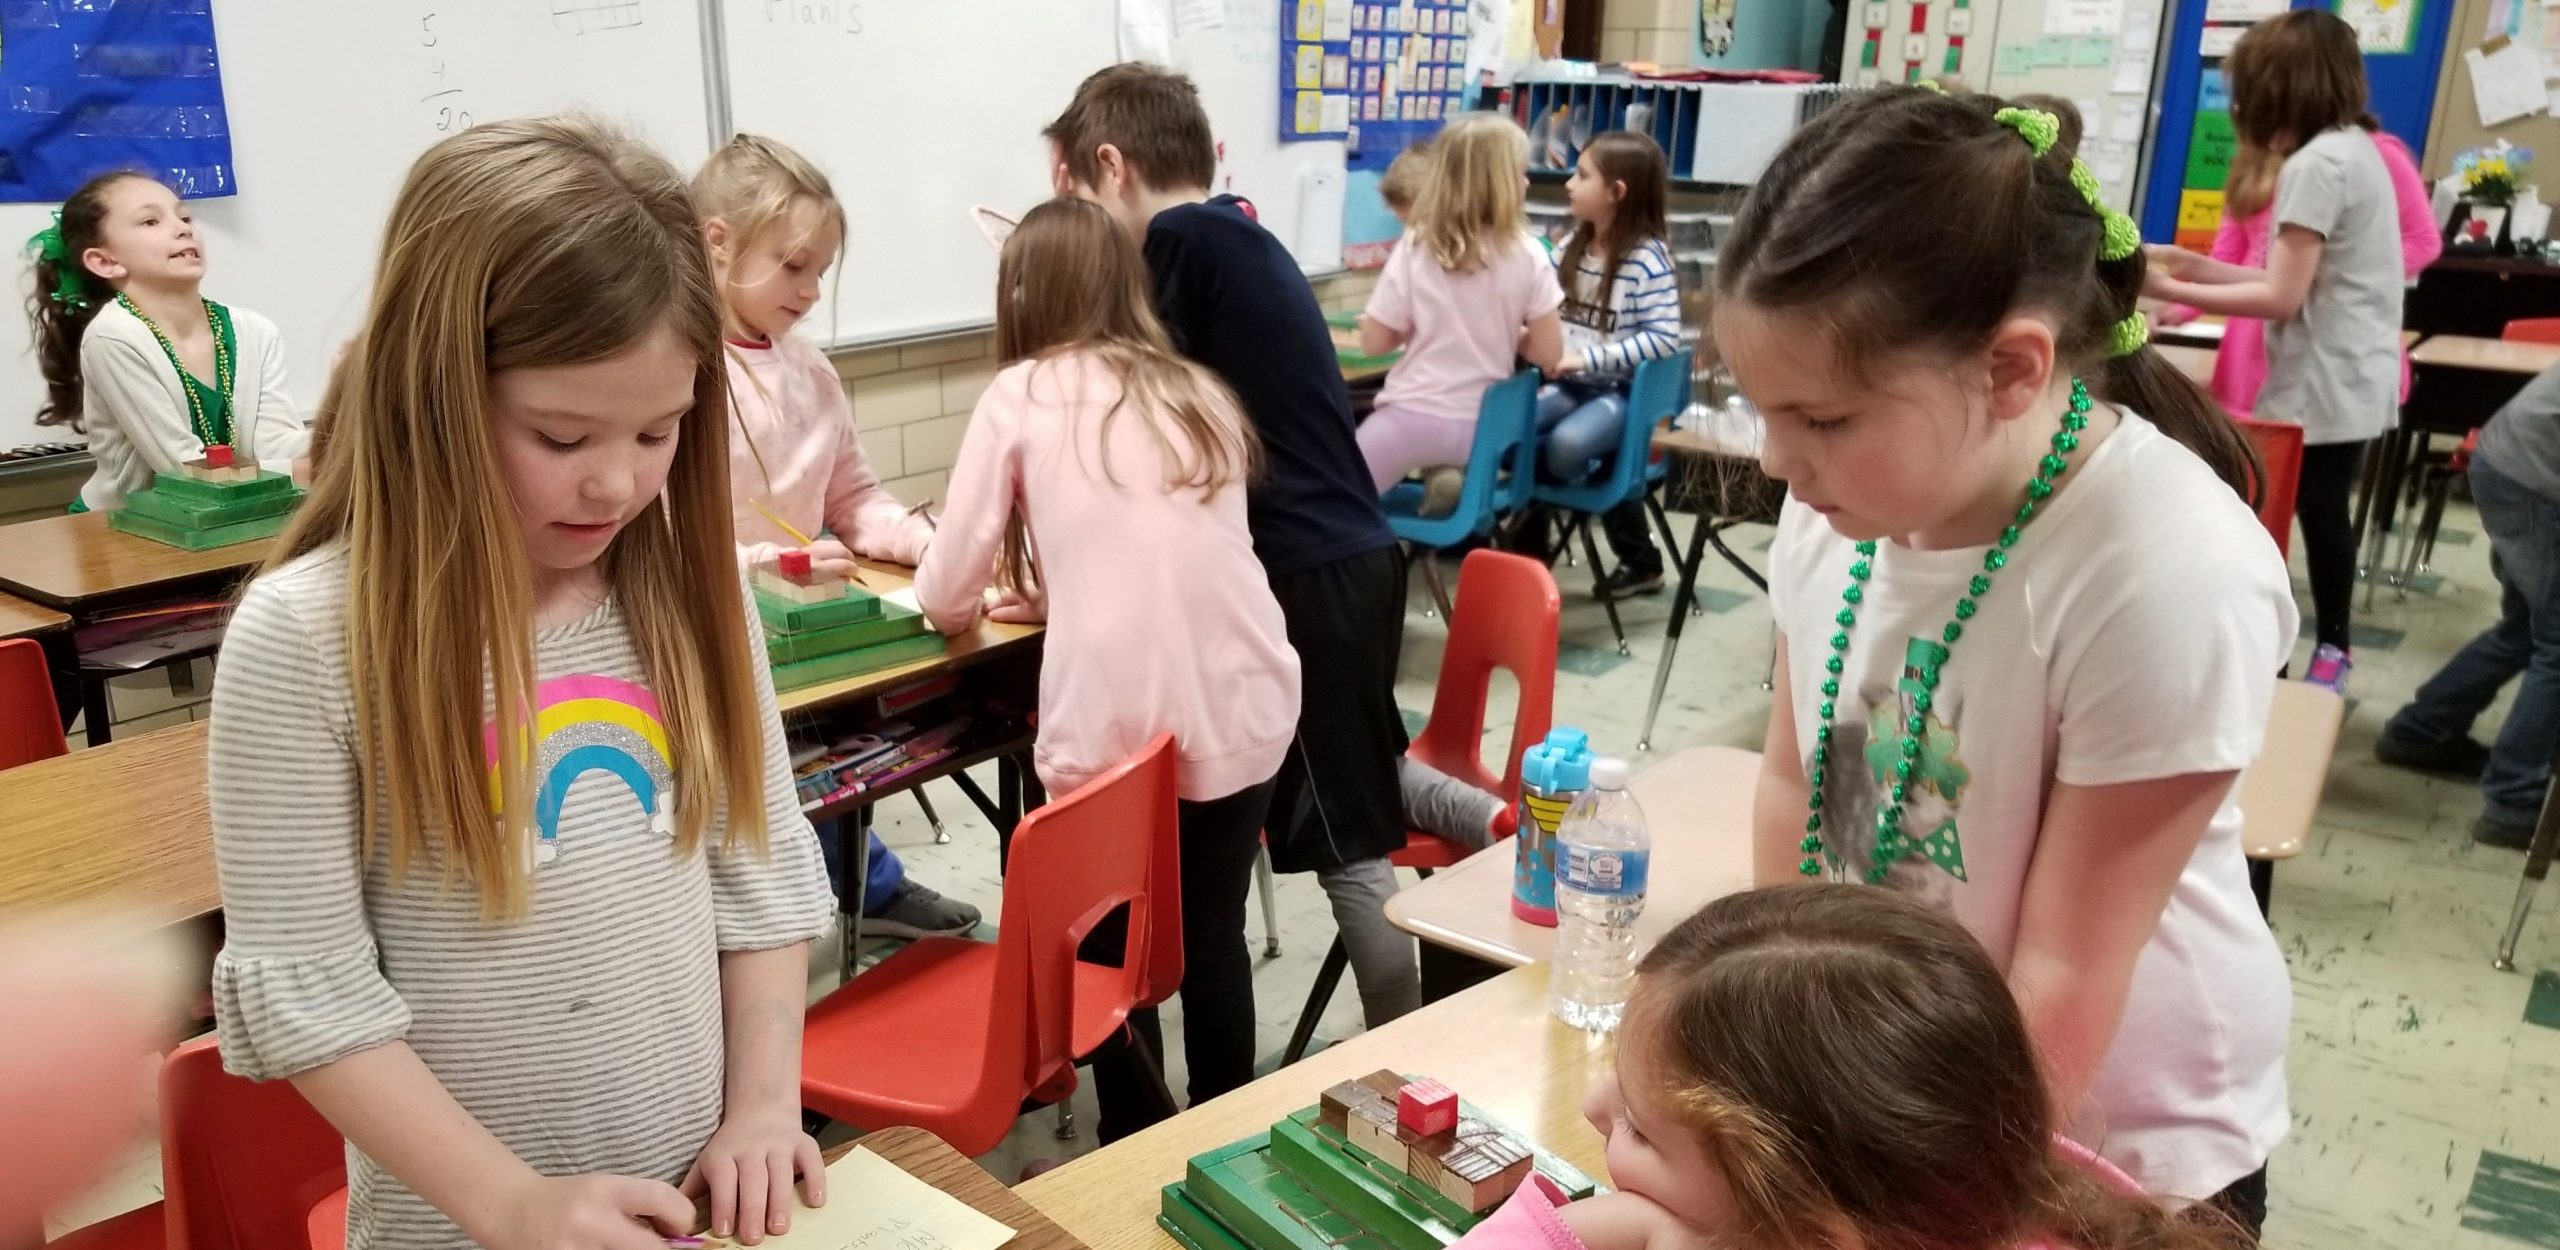 Cardinal School News | Geauga County Maple Leaf within U Of Akron Spring Break 2020